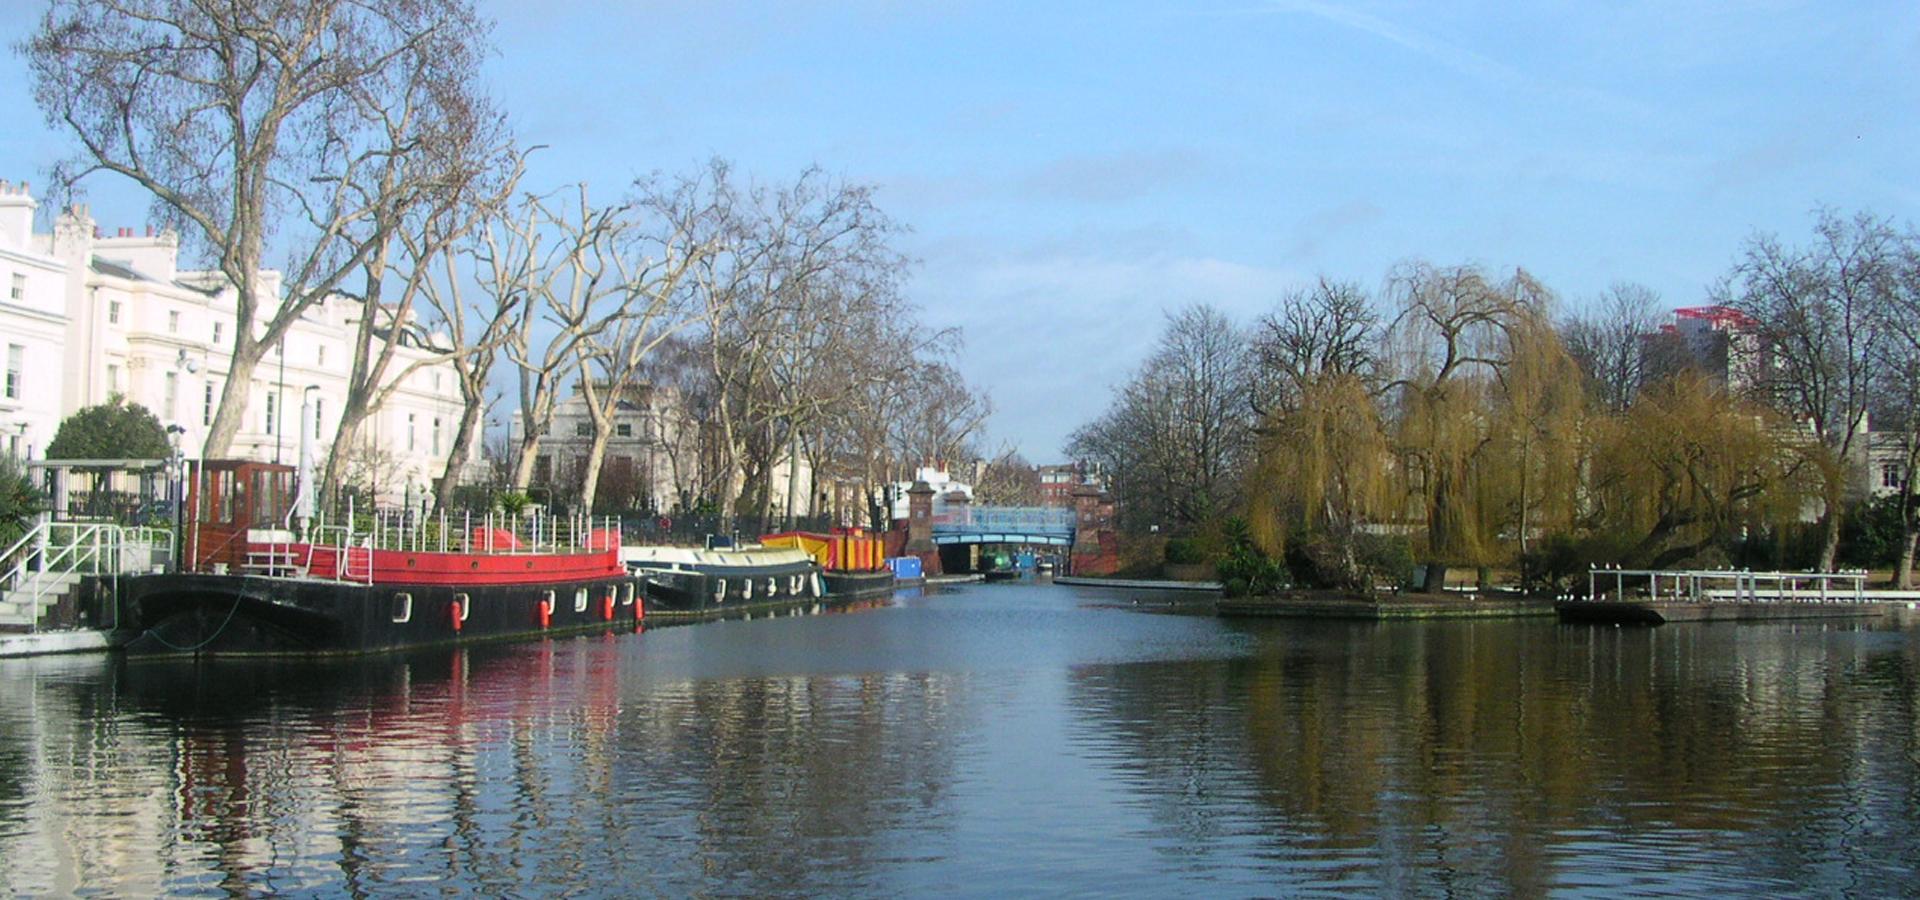 Peer-to-peer advisory in Maida Vale, Greater London, England, Great Britain